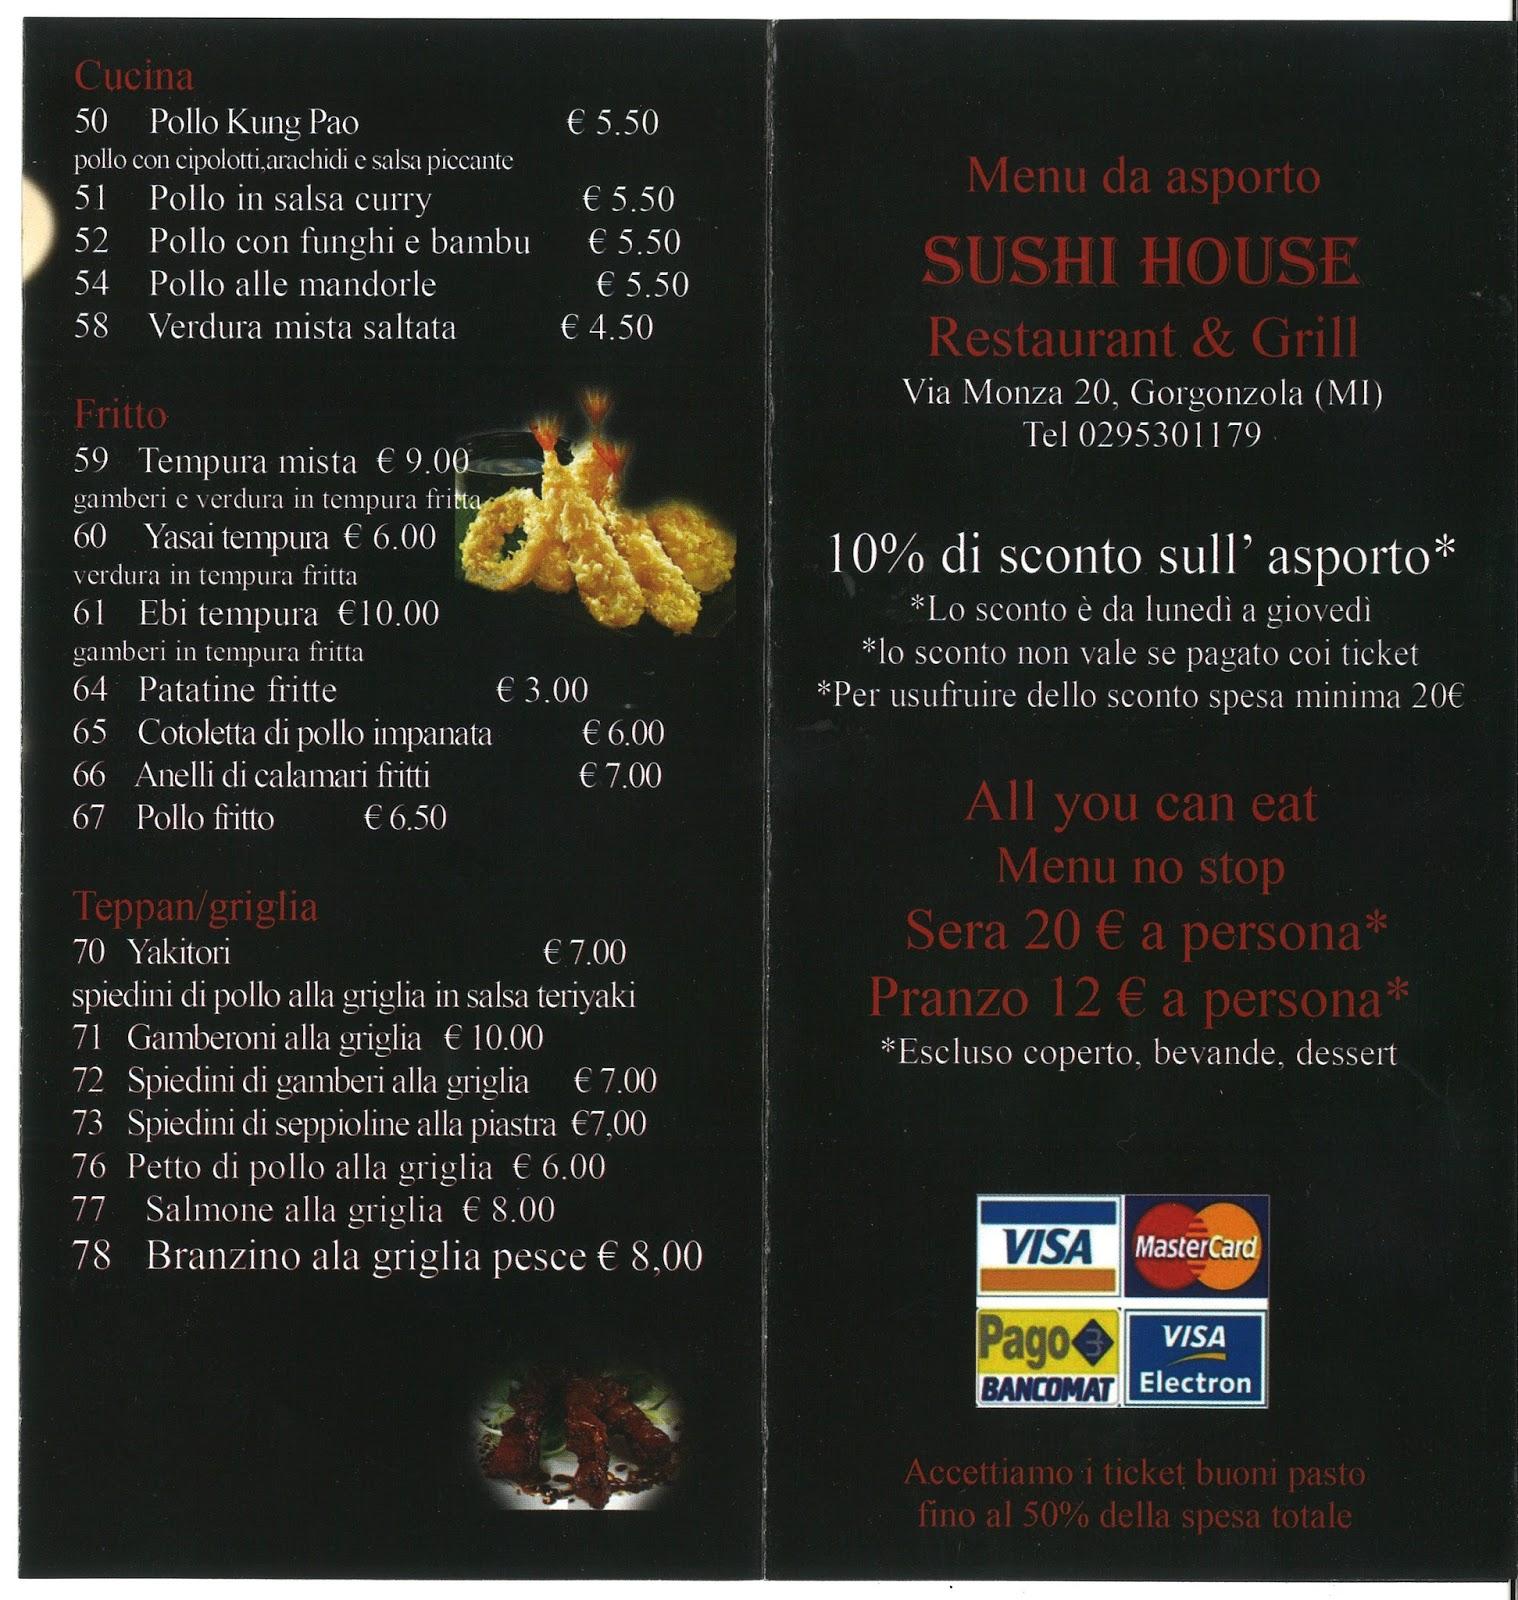 Note Menu alla carta oppure all you can eat a pranzo 12 euro, cena 20 euro